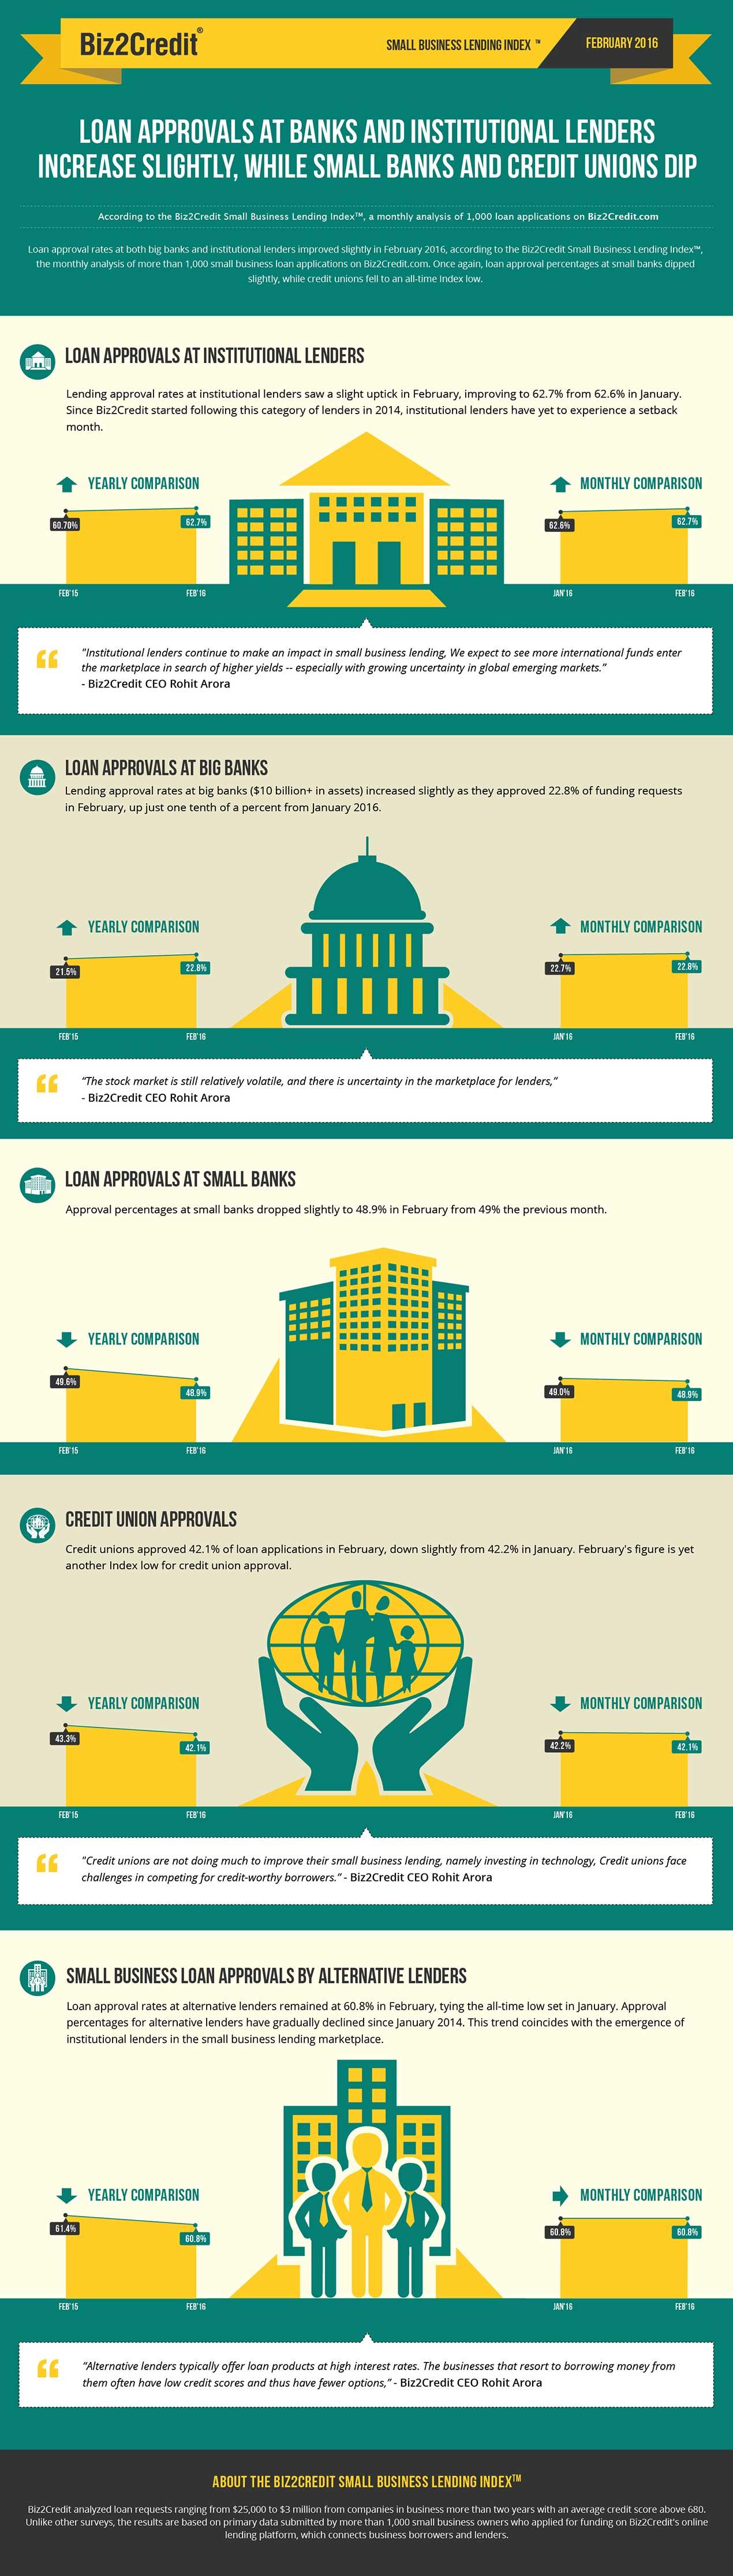 feb16 Lending Index Infographic